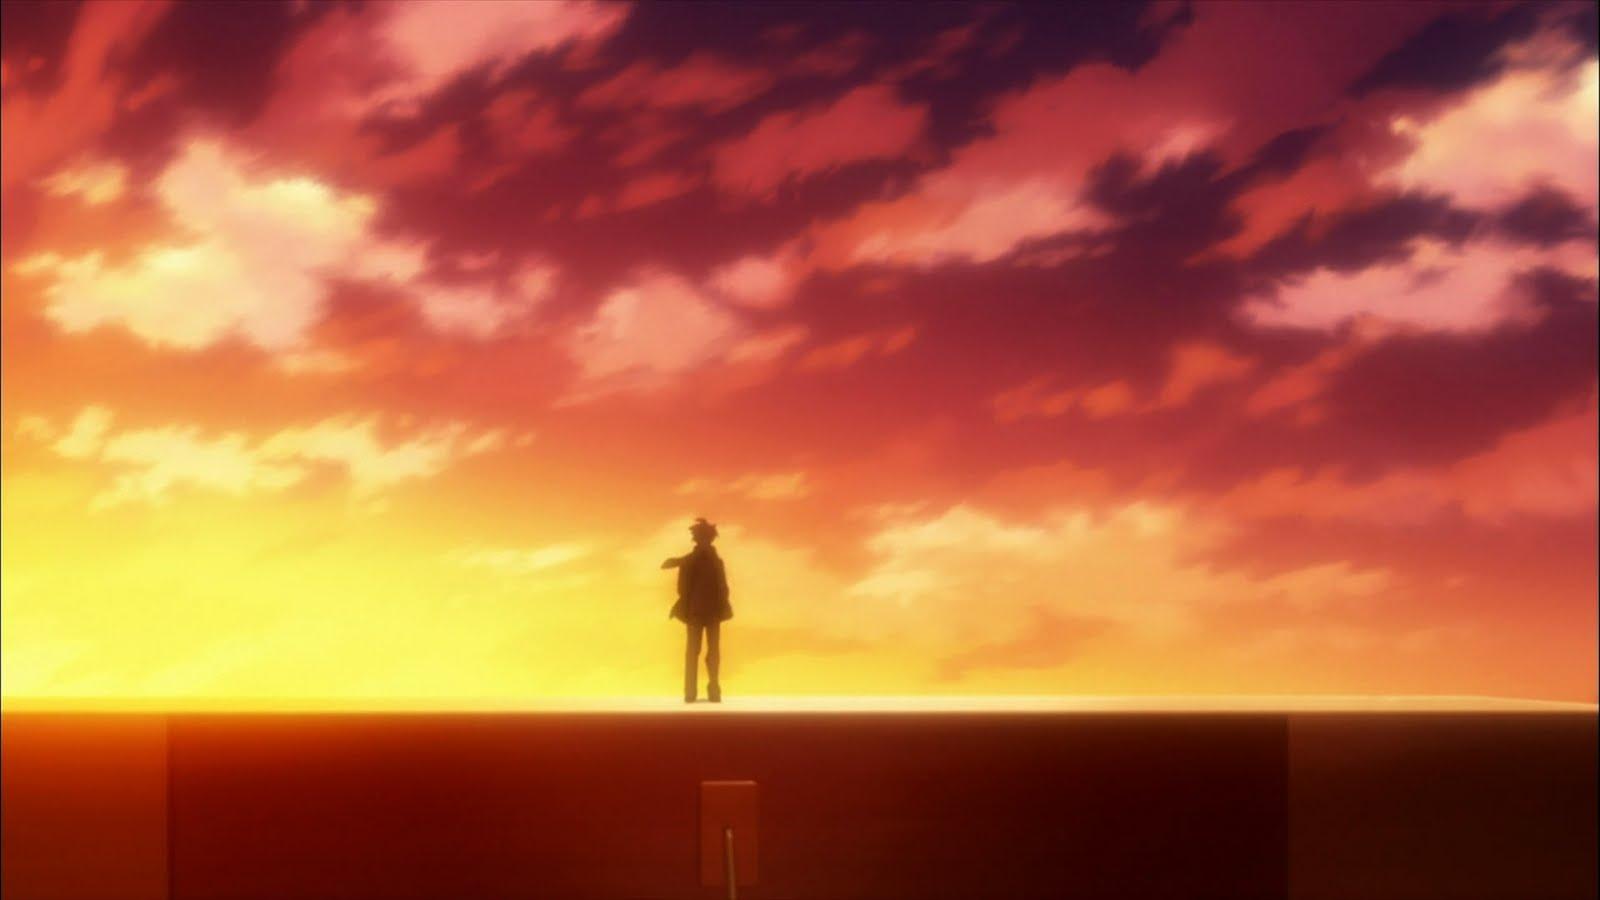 The Never Ending Anime